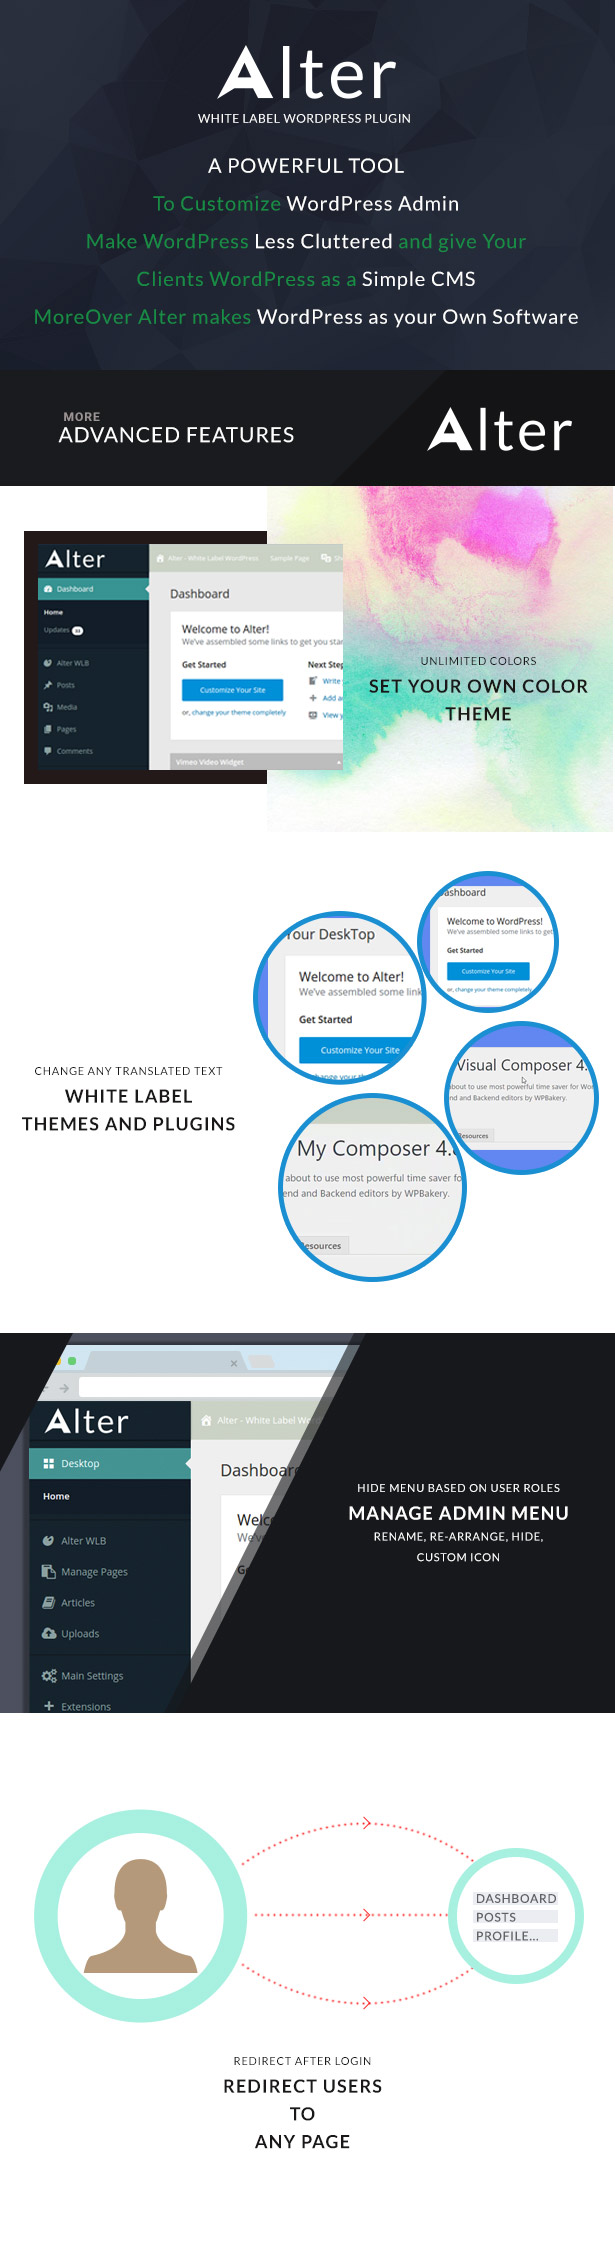 Alter White Label WordPress Plugin features